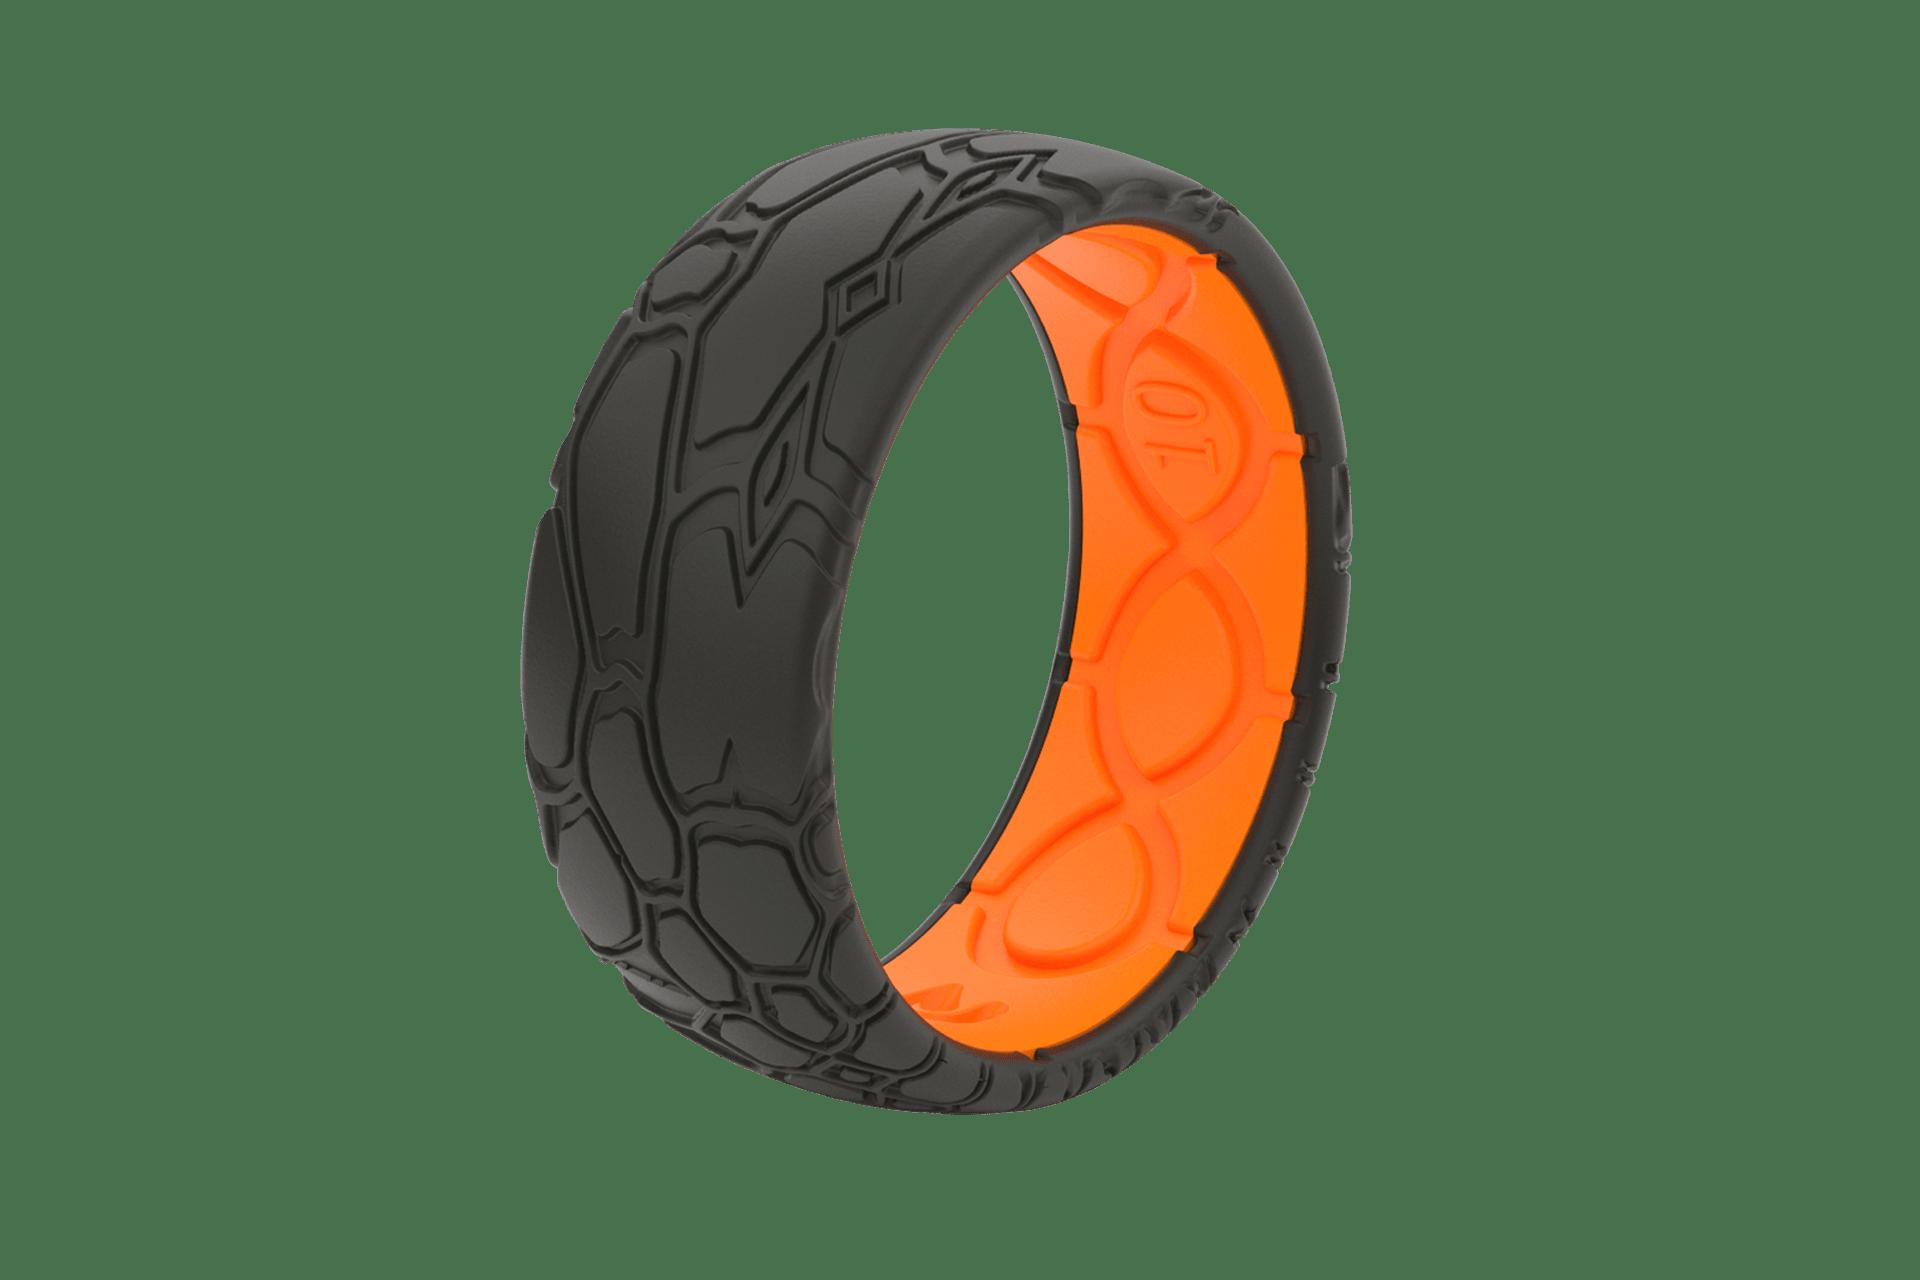 Original Dimension Kryptek Midnight Black/Orange -  viewed from side